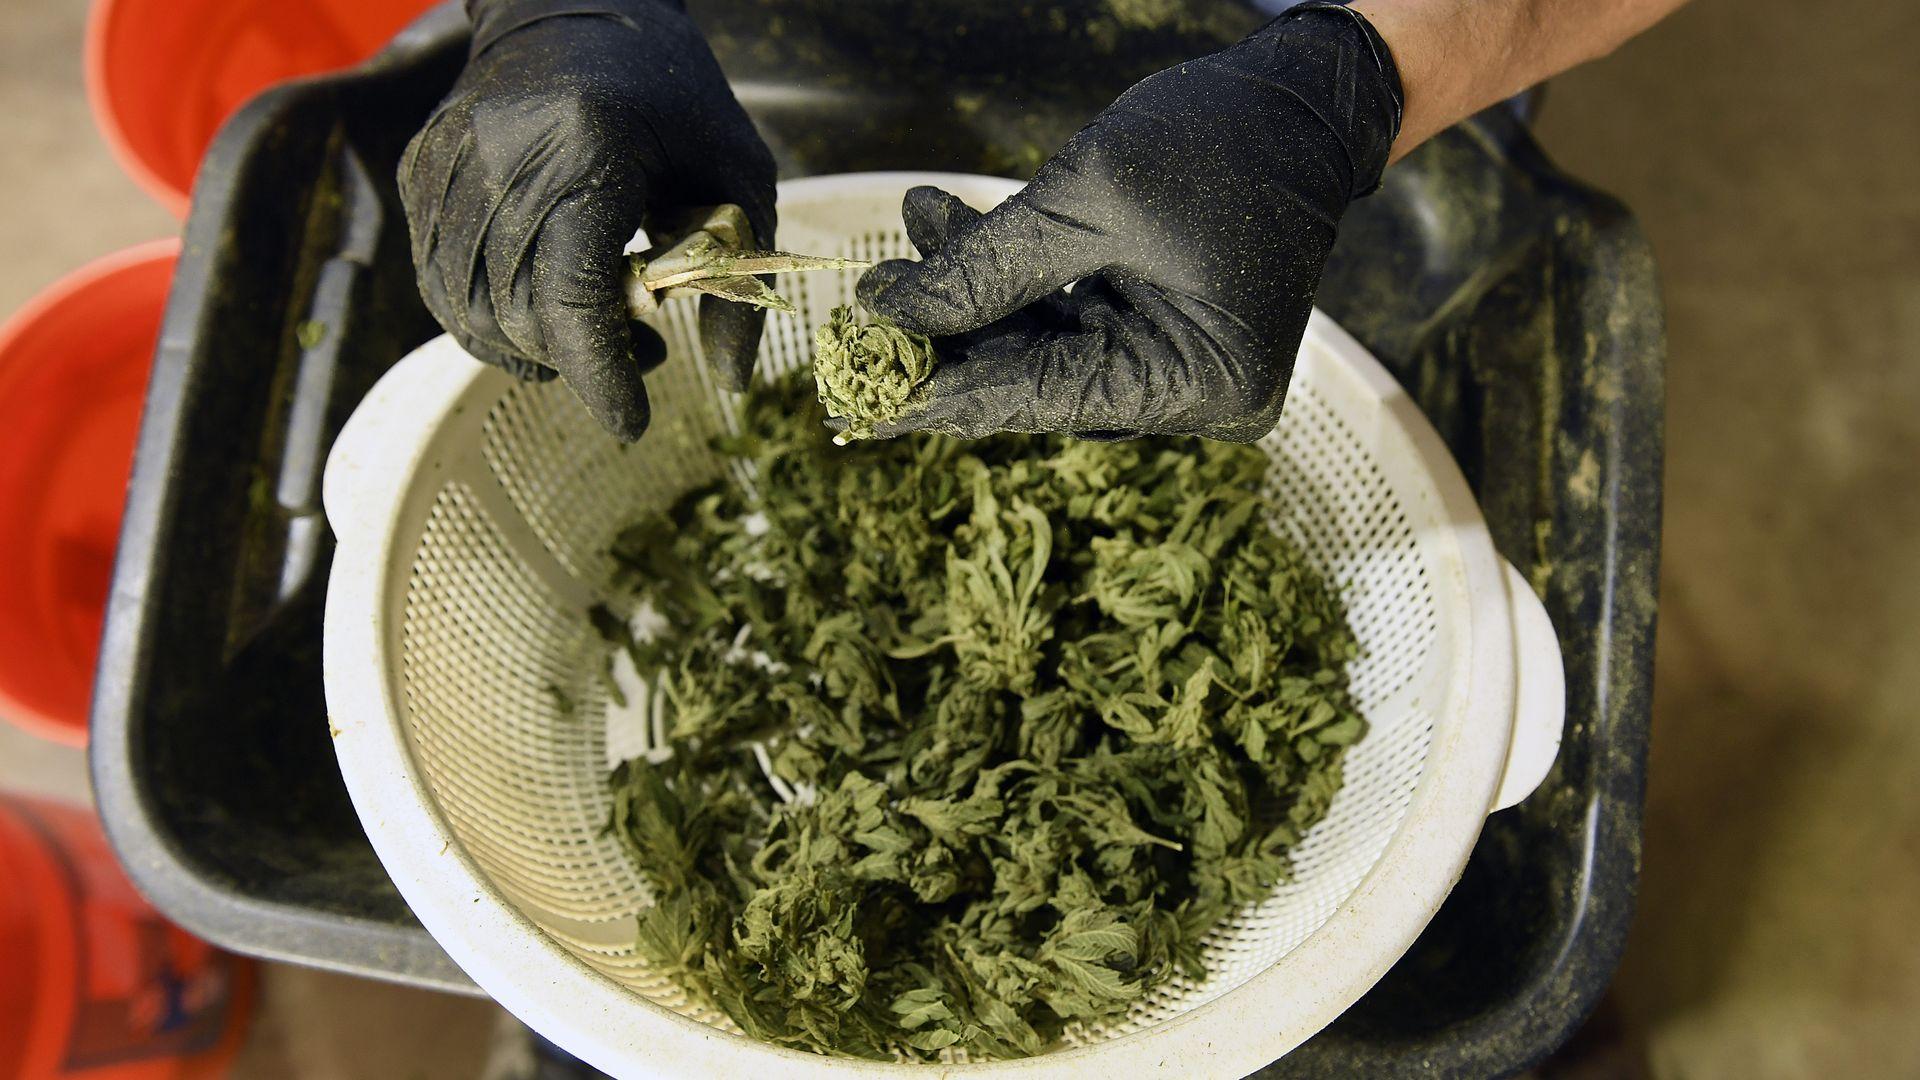 Someone pruning marijuana buds.